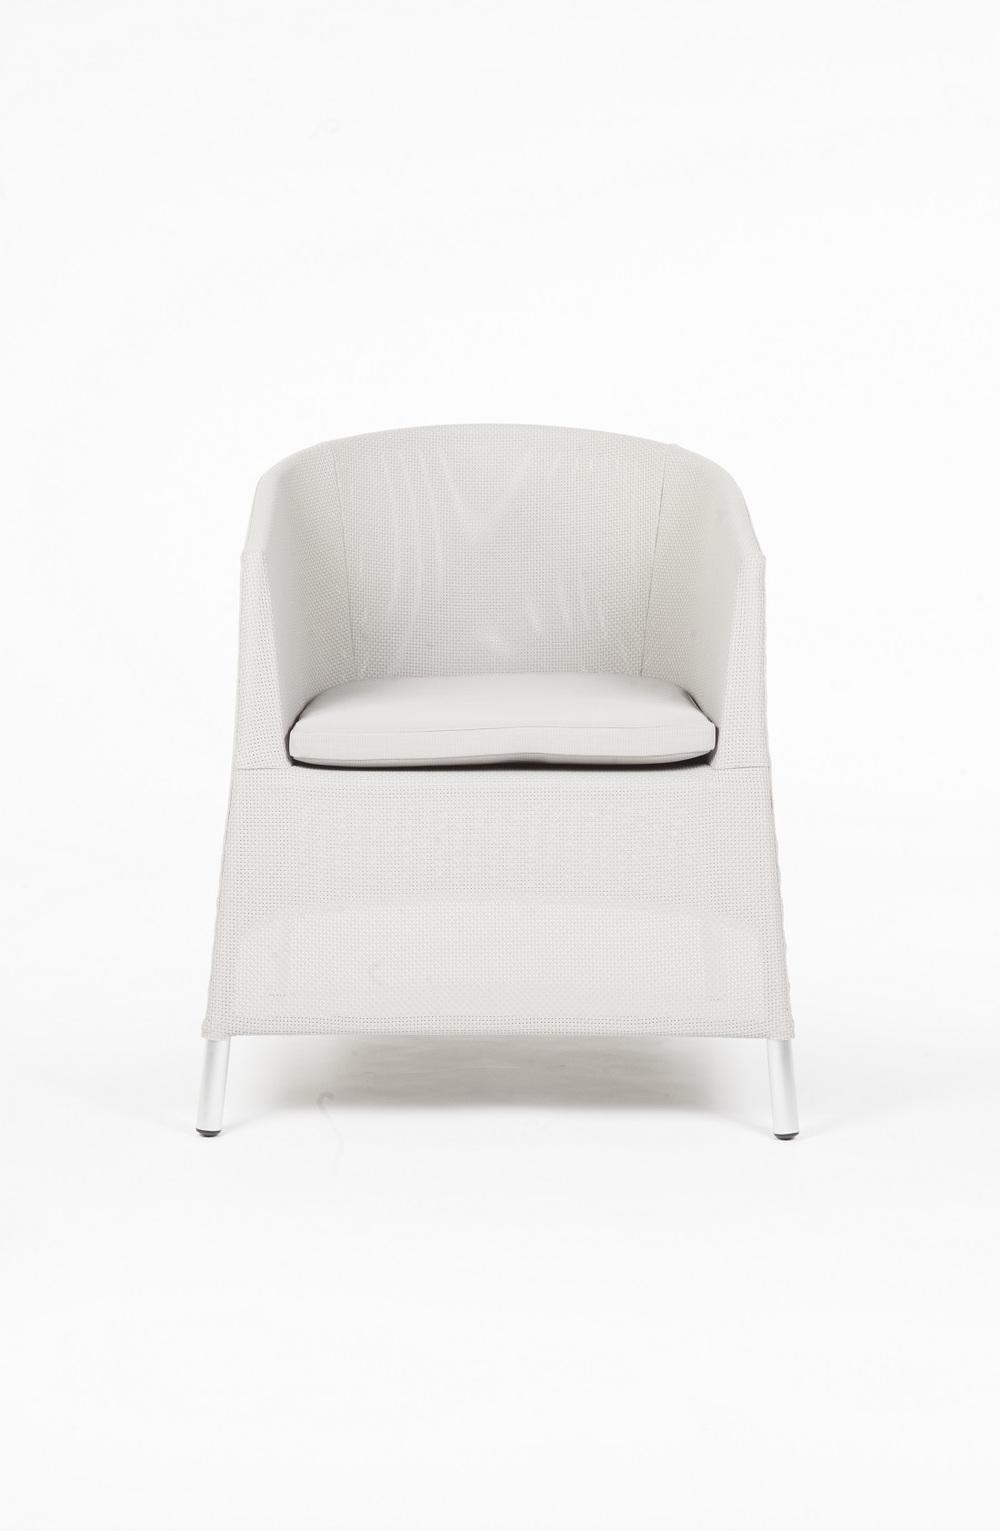 Control Brand - Kos Arm Chair